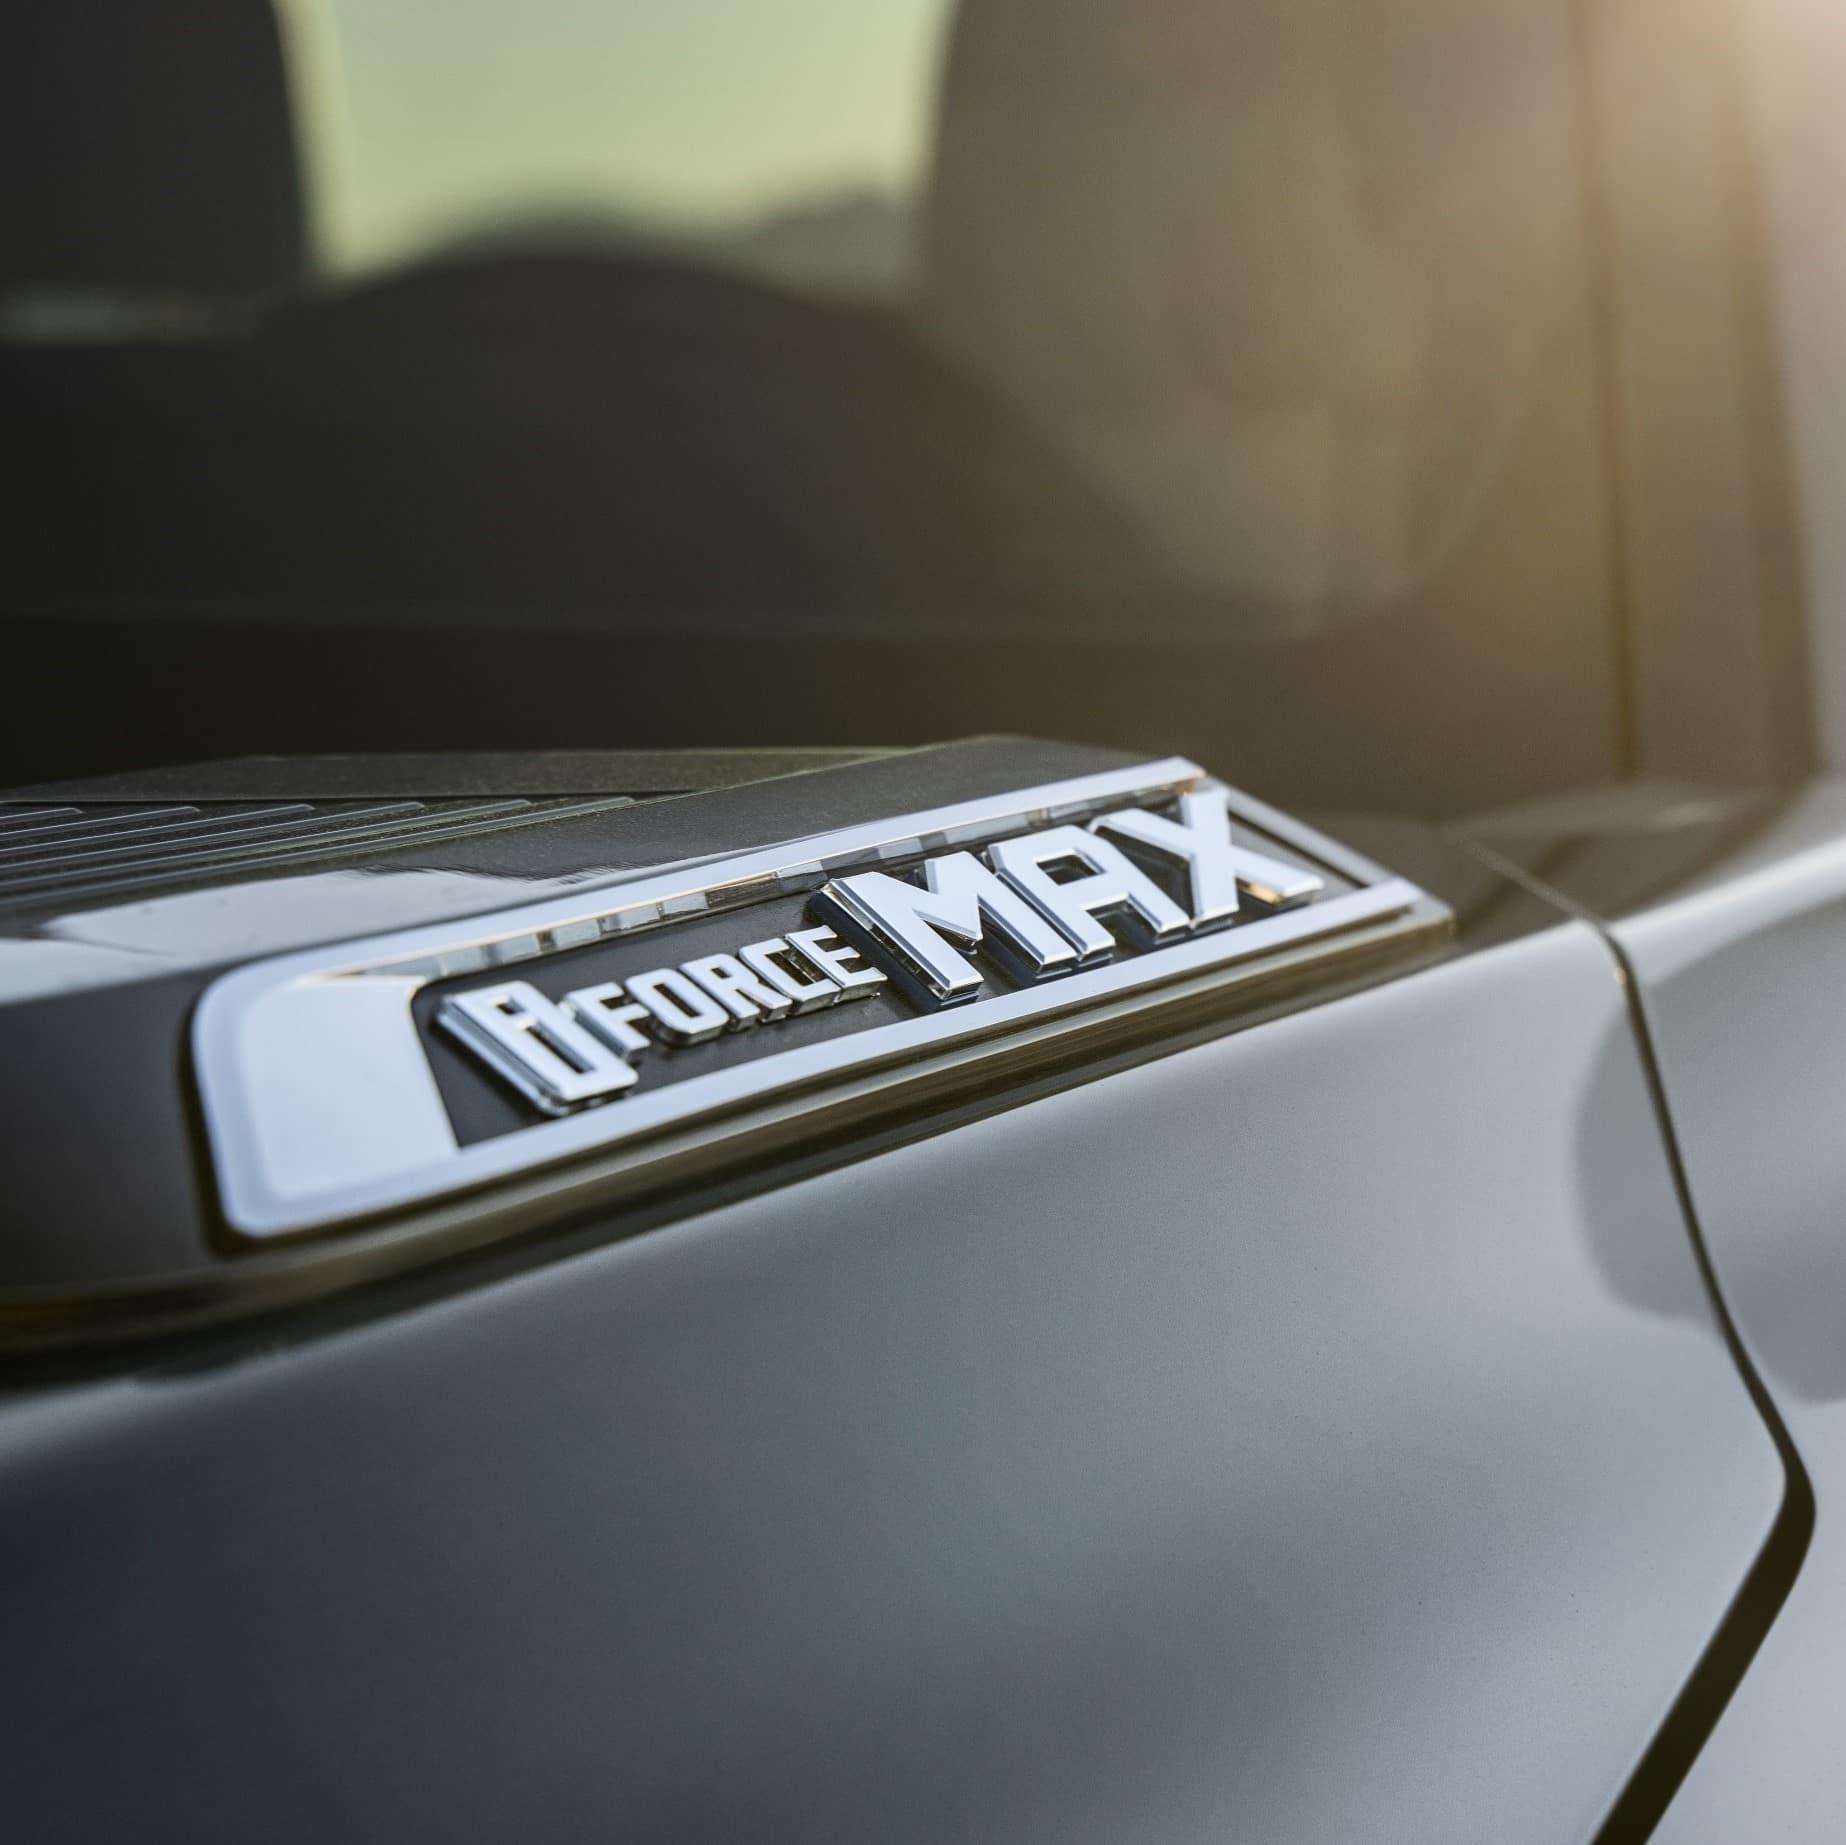 2022 Toyota Tundra Engine Options